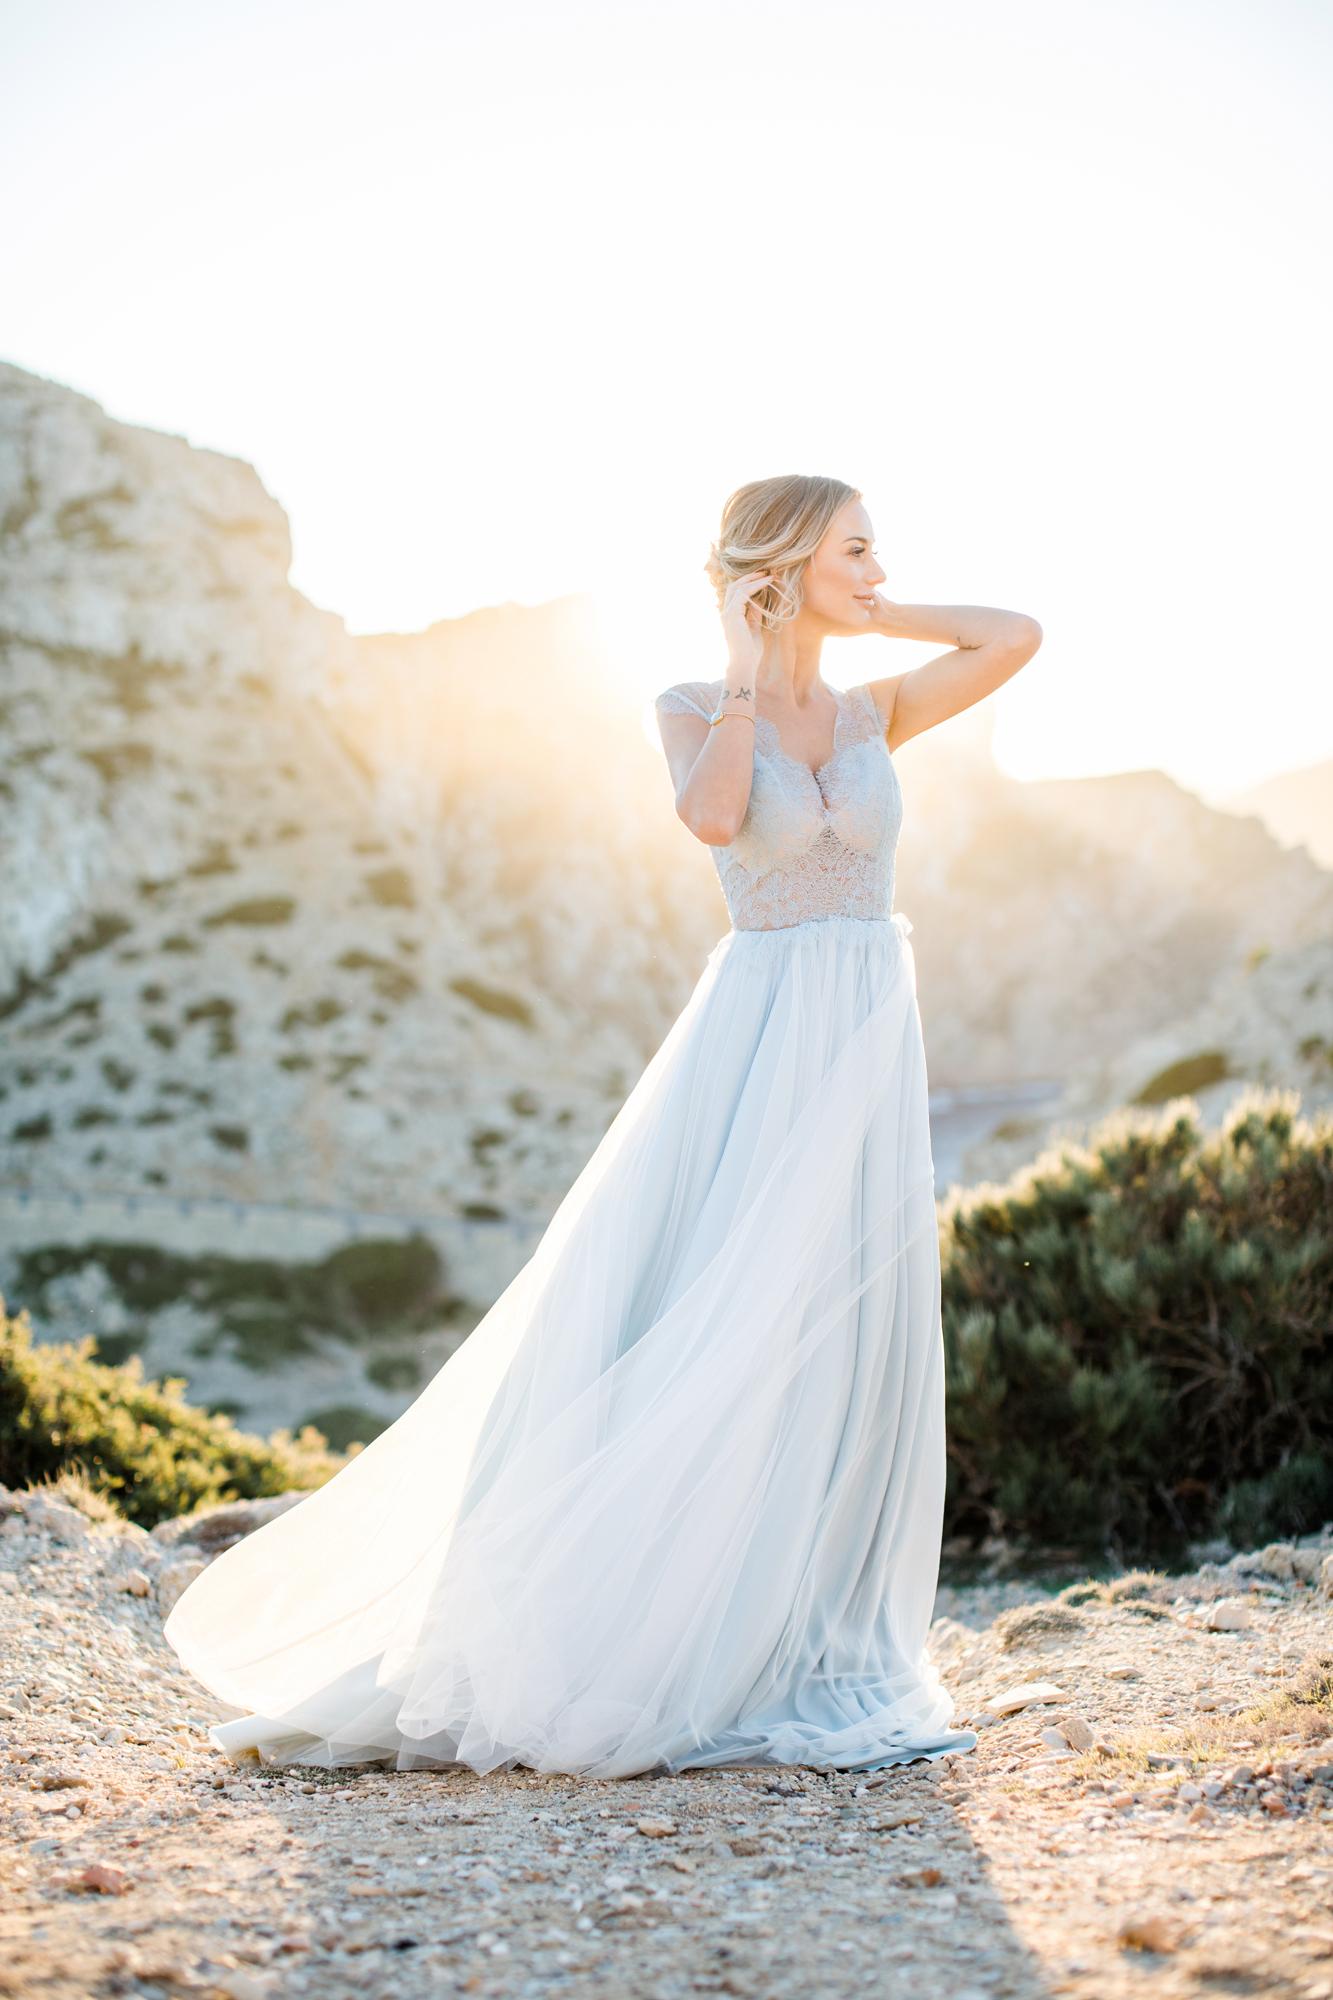 Heiraten auf Mallorca, Destination Wedding, Elopement Wedding, Hochzeitsfotograf Mallorca, Andreas Nusch Hochzeitsfotografie, Weddingphotographer Mallorca